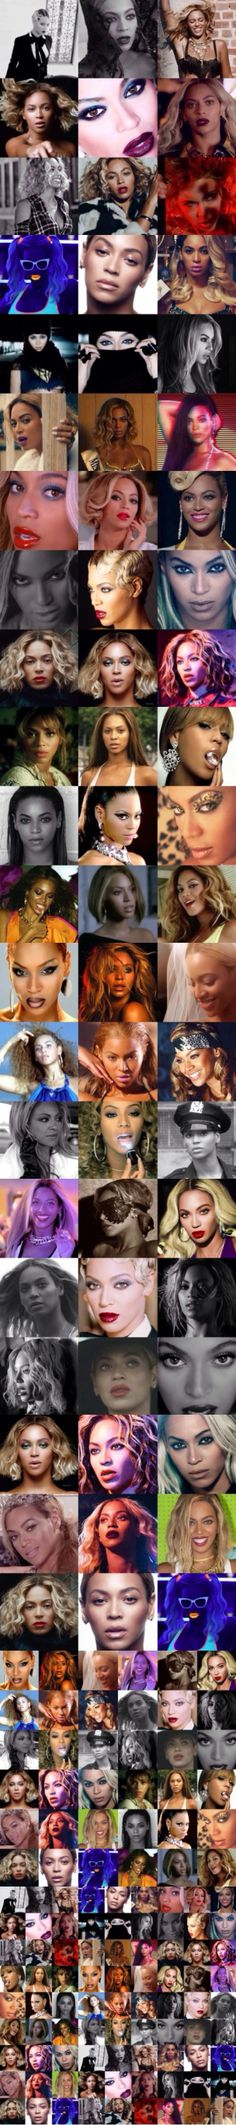 Stills from Beyoncé's BEYONCÉ music videos!